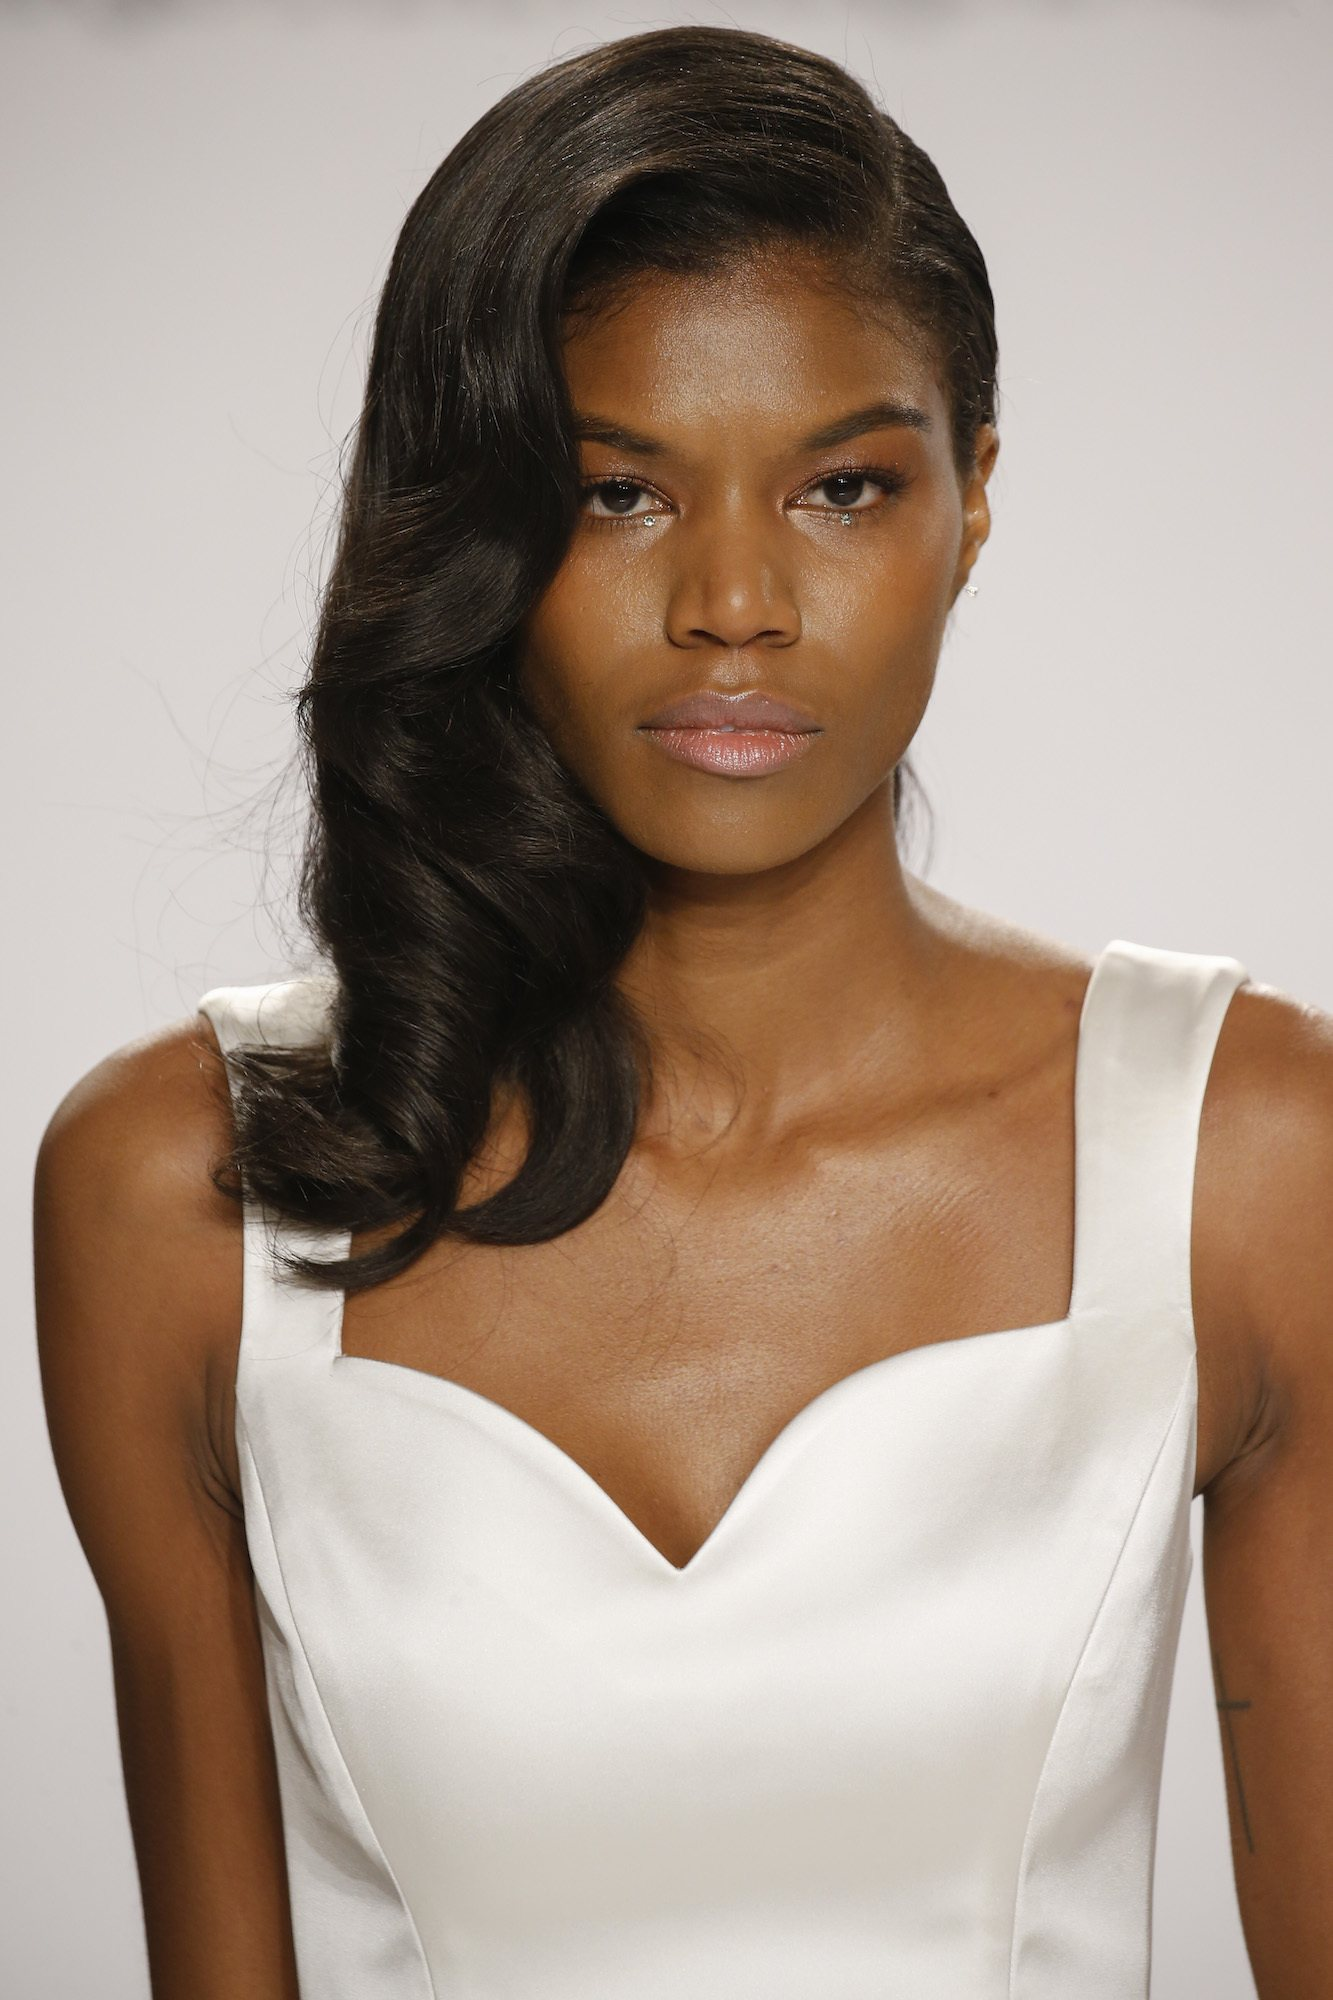 Model rambut yang cocok untuk wajah lonjong - Side waves.